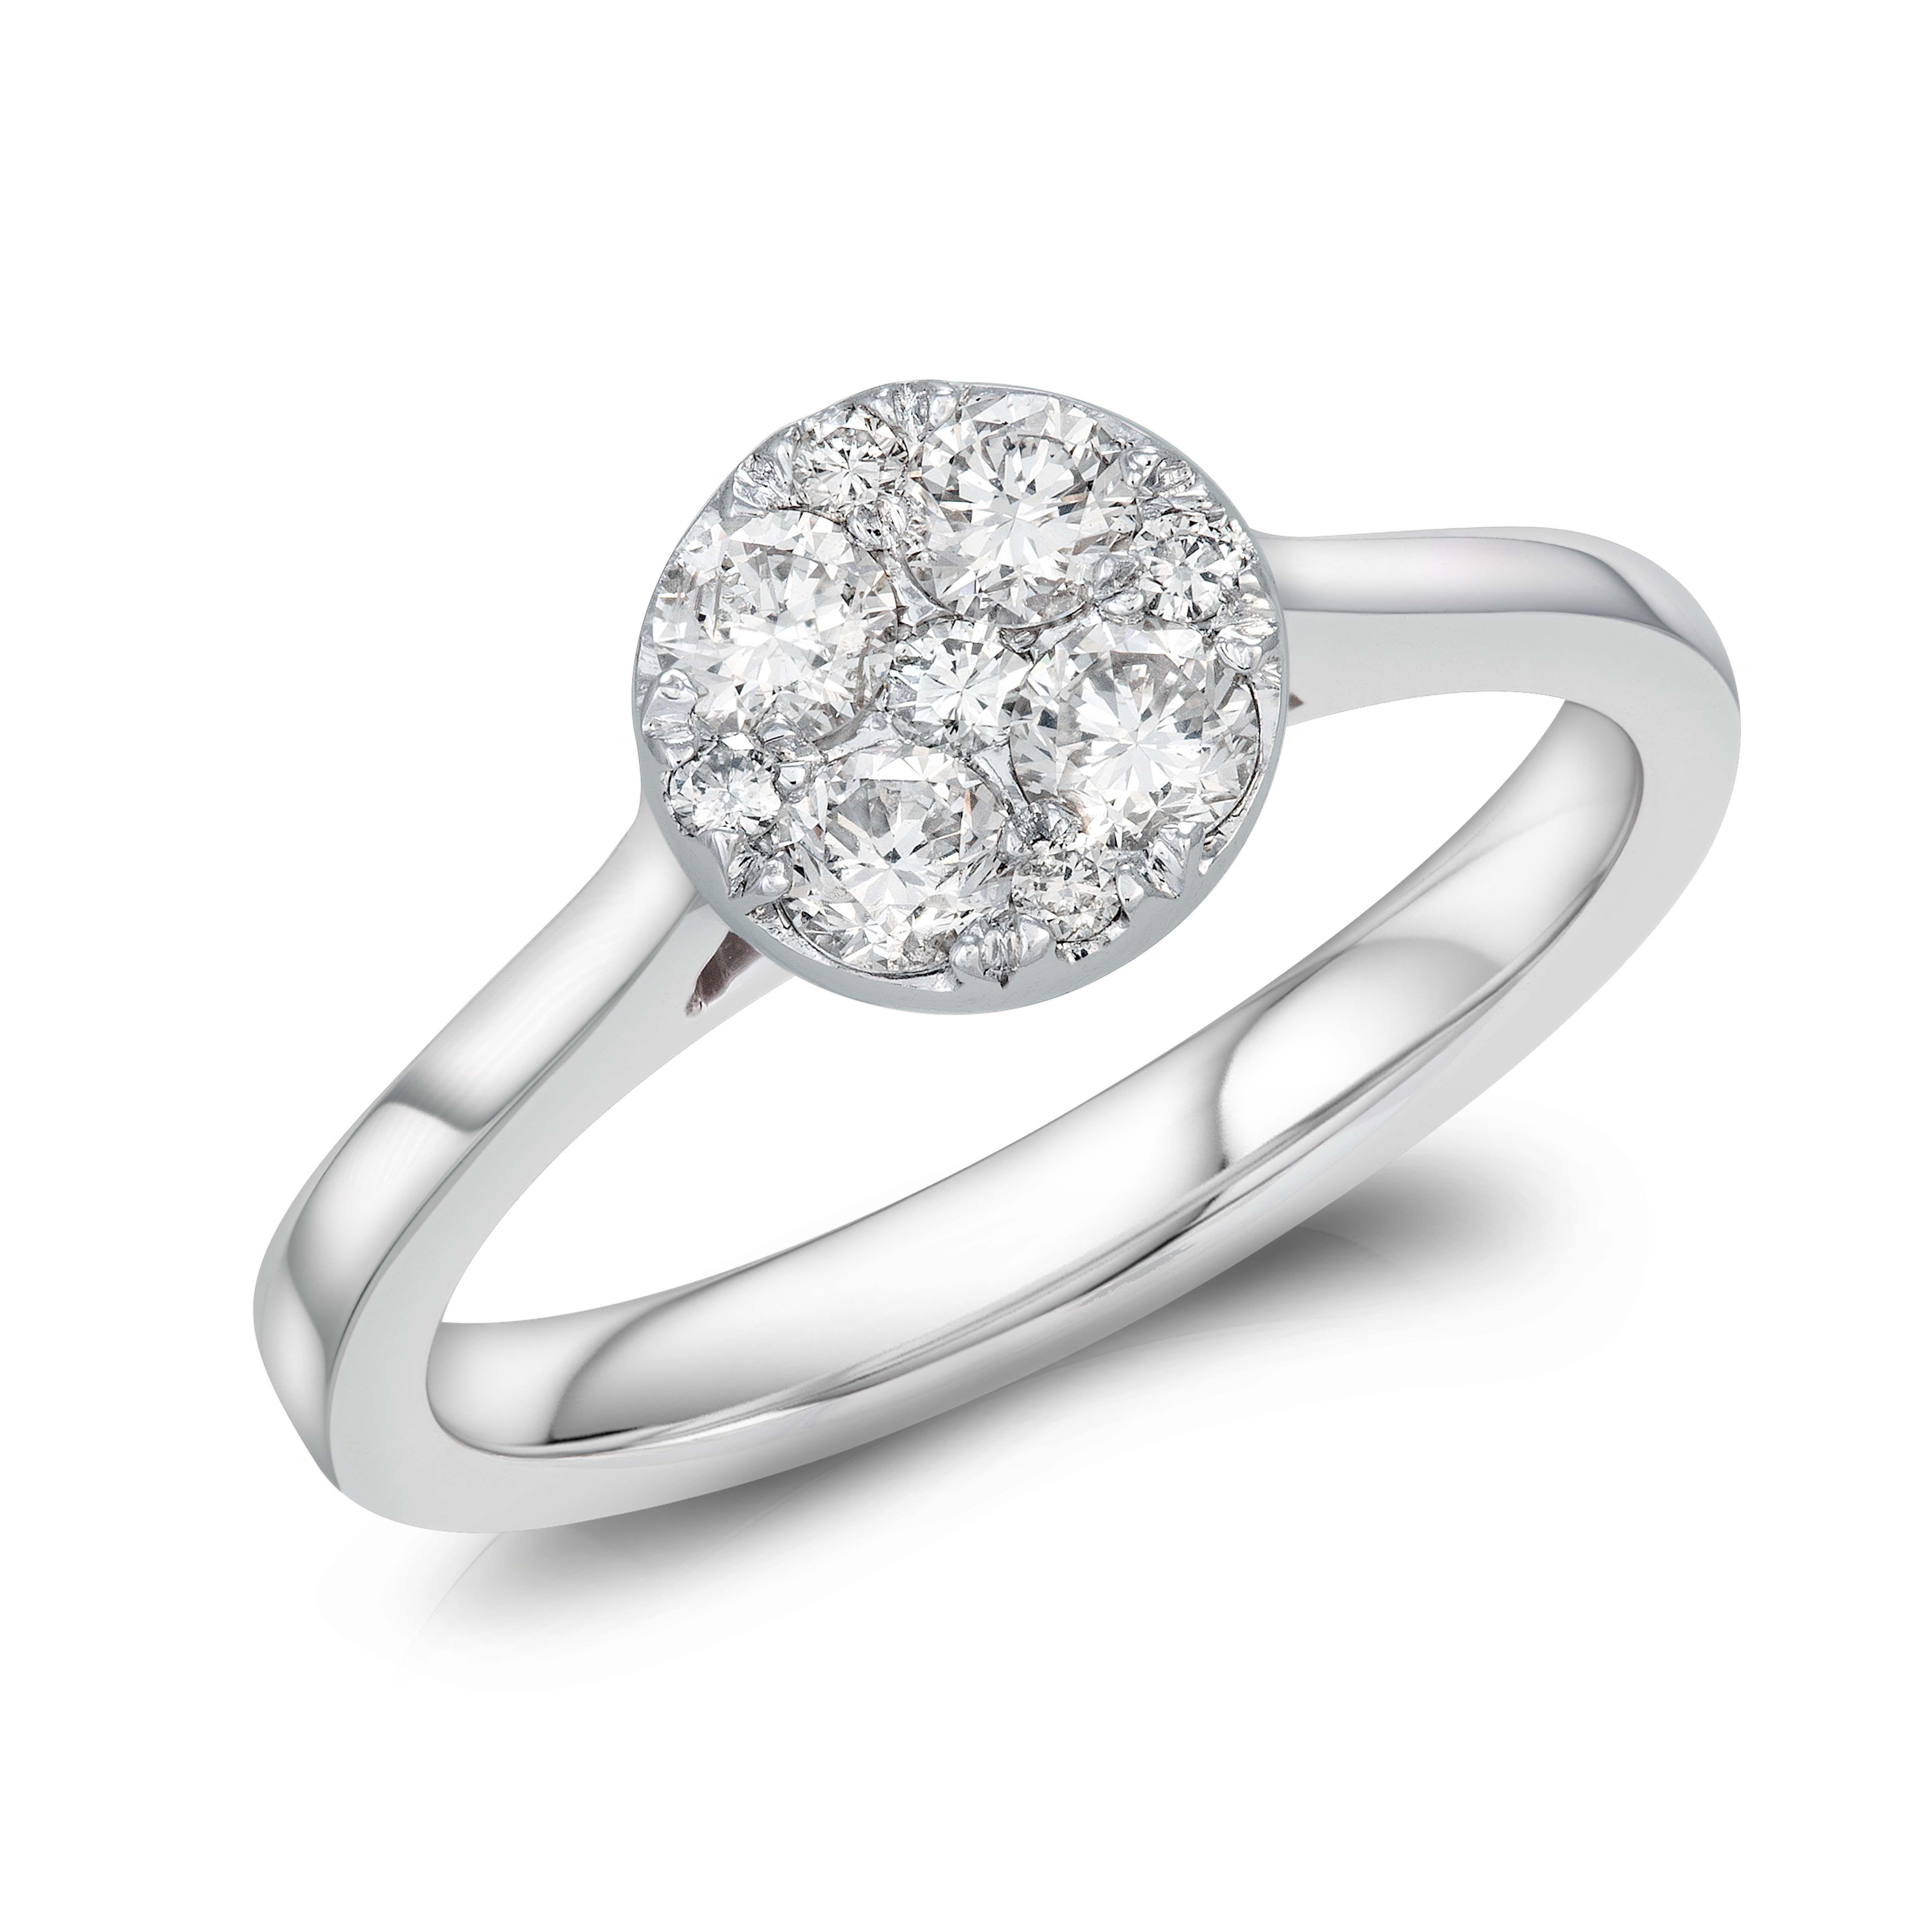 18CT WHITE GOLD ROUND REVERIE DIAMOND RING NON HALO 1.00CT